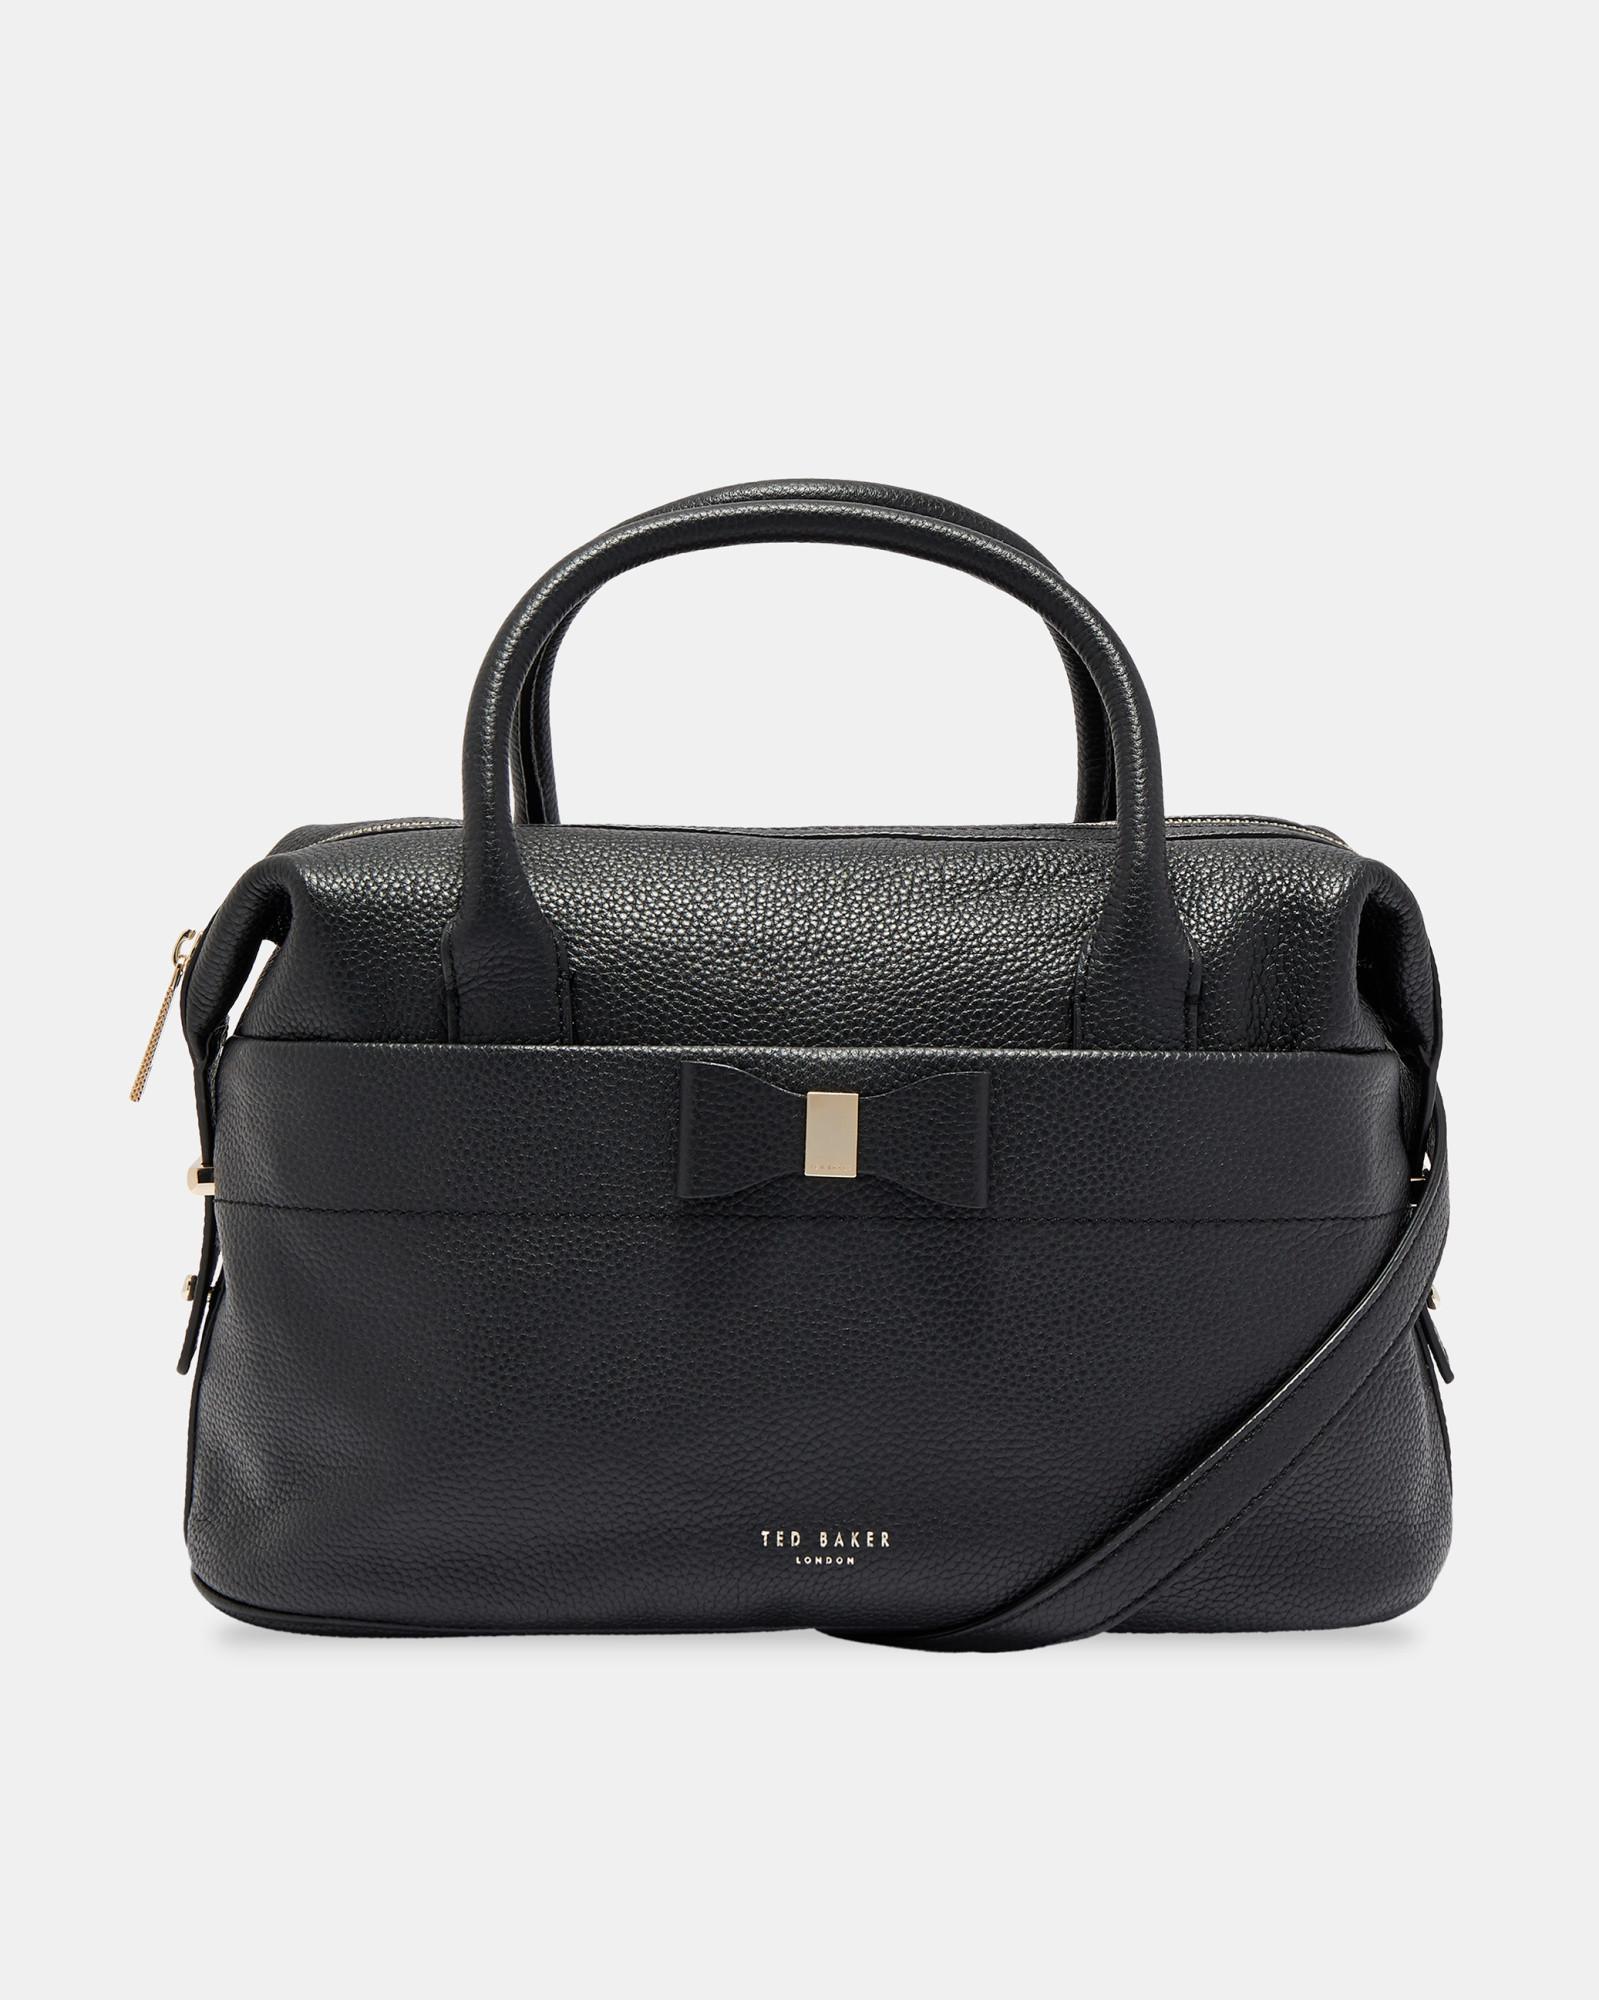 c14ba8355d7 Ted Baker Anala Leather Grab Bag in Black - Lyst